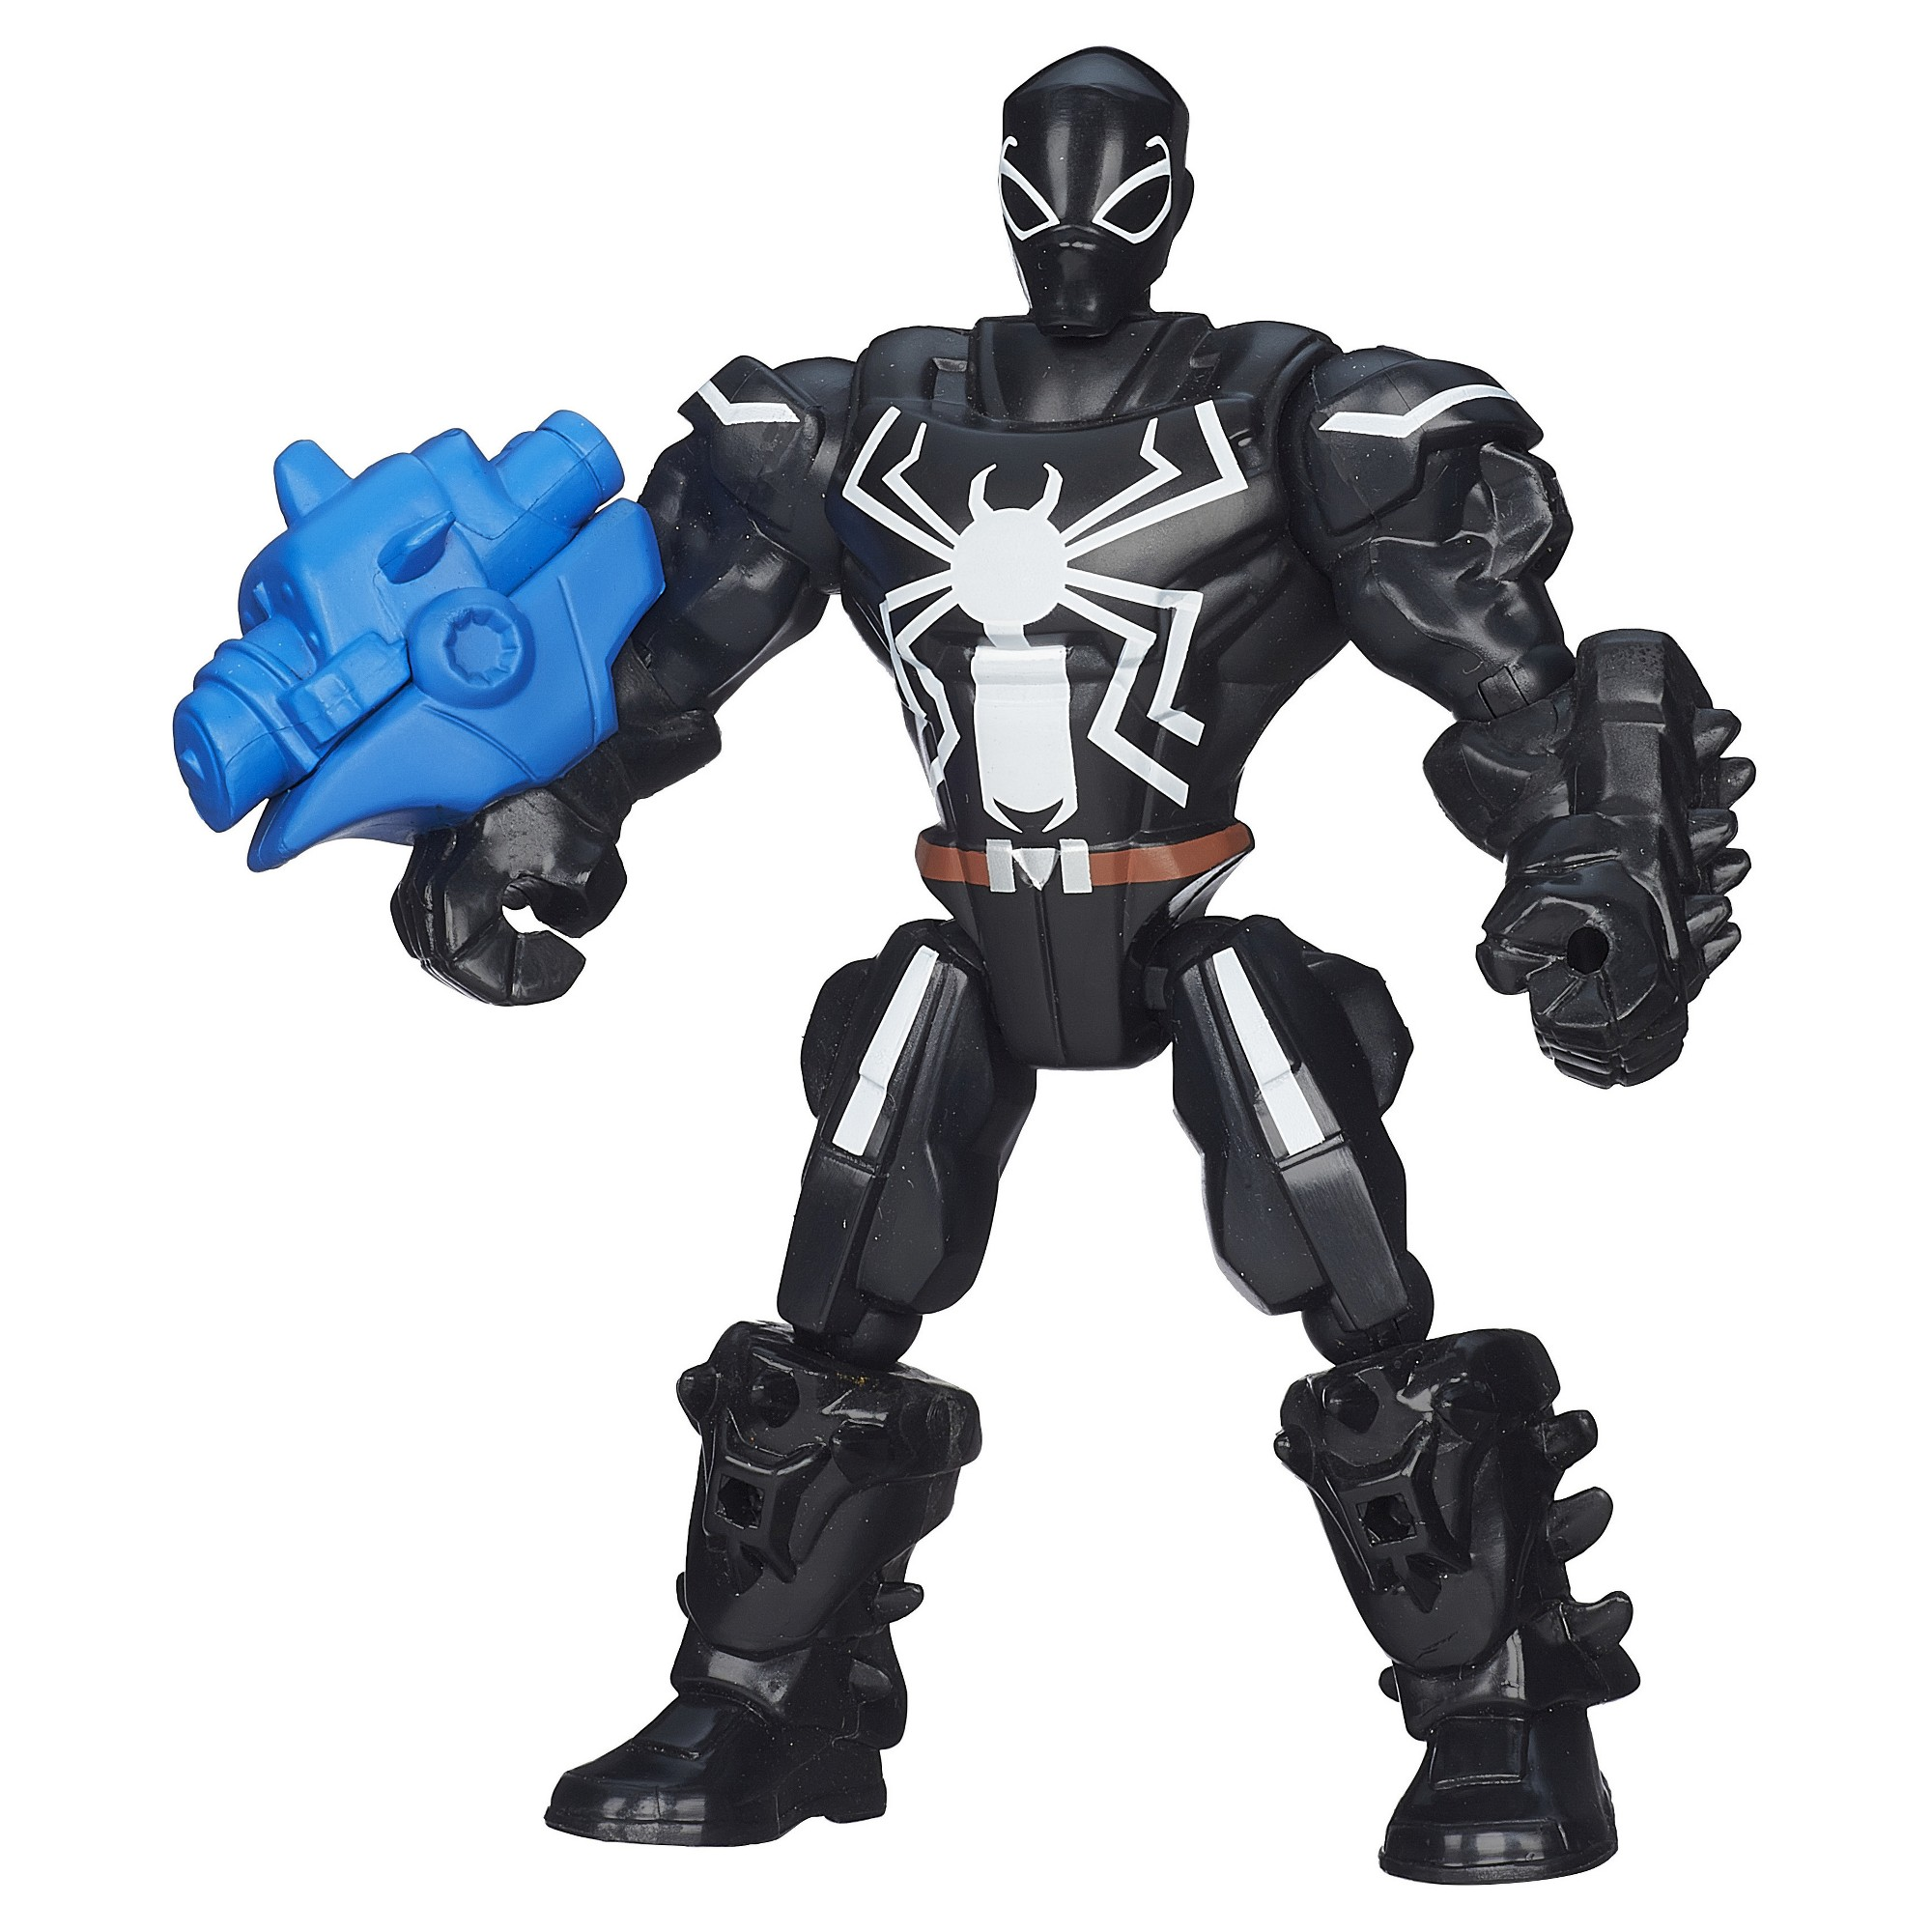 Marvel Super Hero Mashers Agent Venom Marvel action